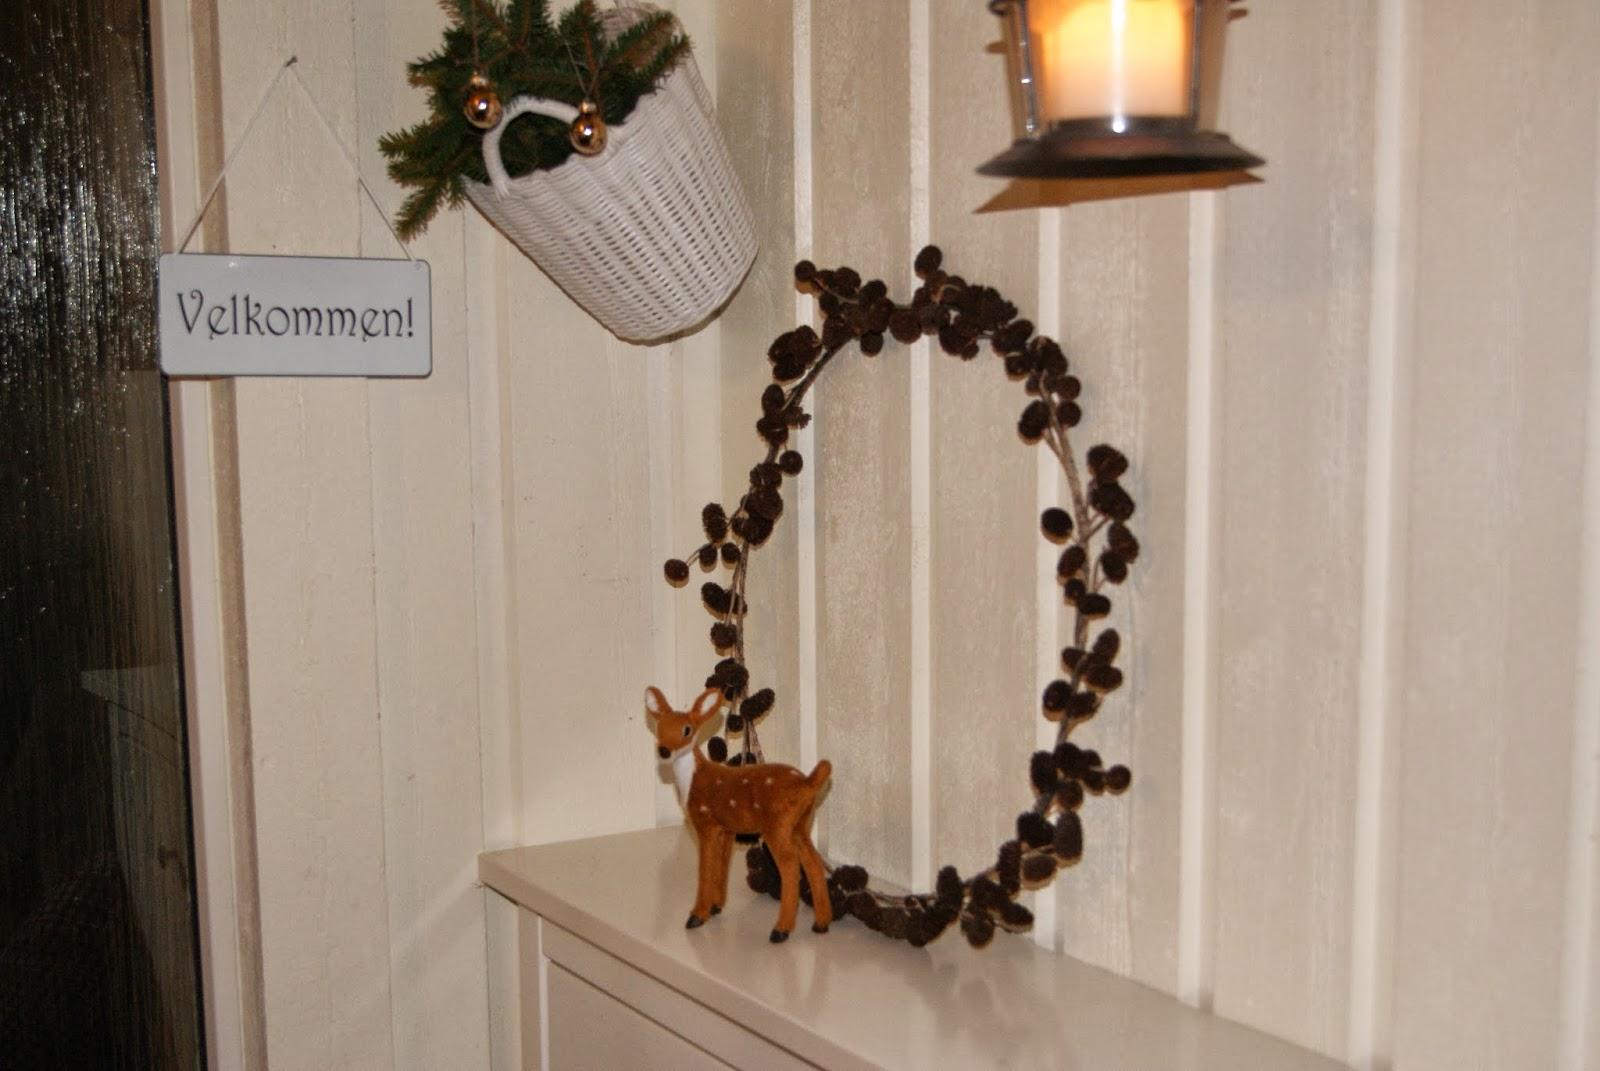 Turidshverdagslykke: jul på trappa